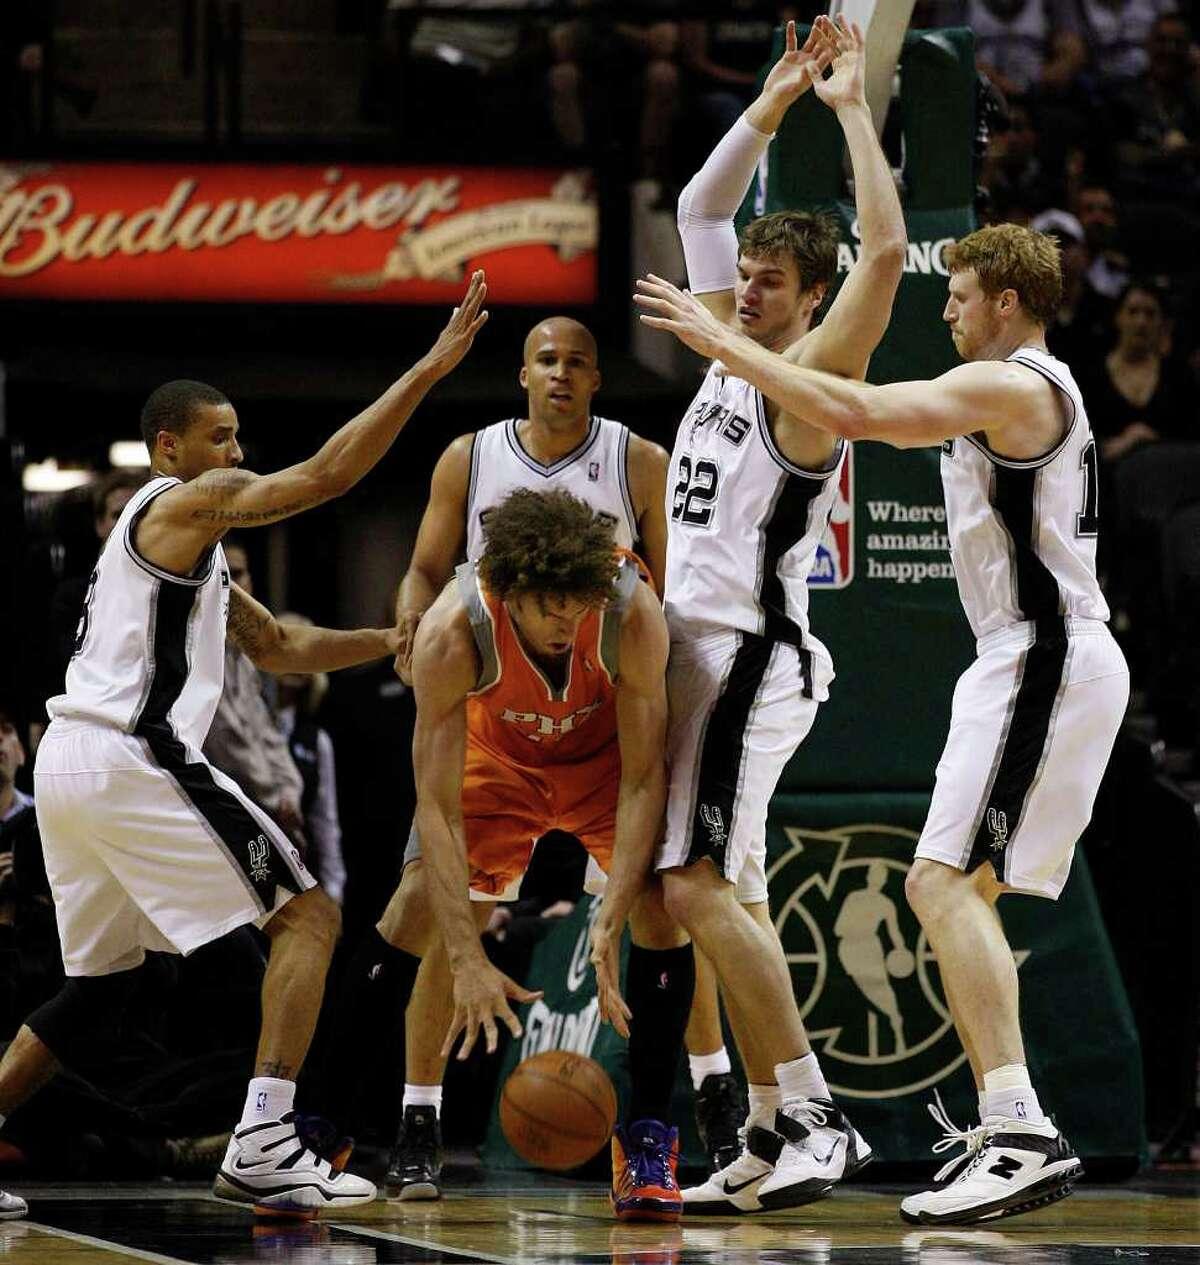 SPURS -- San Antonio Spurs, from left, George Hill, Richard Jefferson, Tiago Splitter and Matt Bonner surround Phoenix Suns Robin Lopez during the second half at the AT&T Center, Sunday, April 3, 2011. The Spurs won 114-97. JERRY LARA/glara@express-news.net